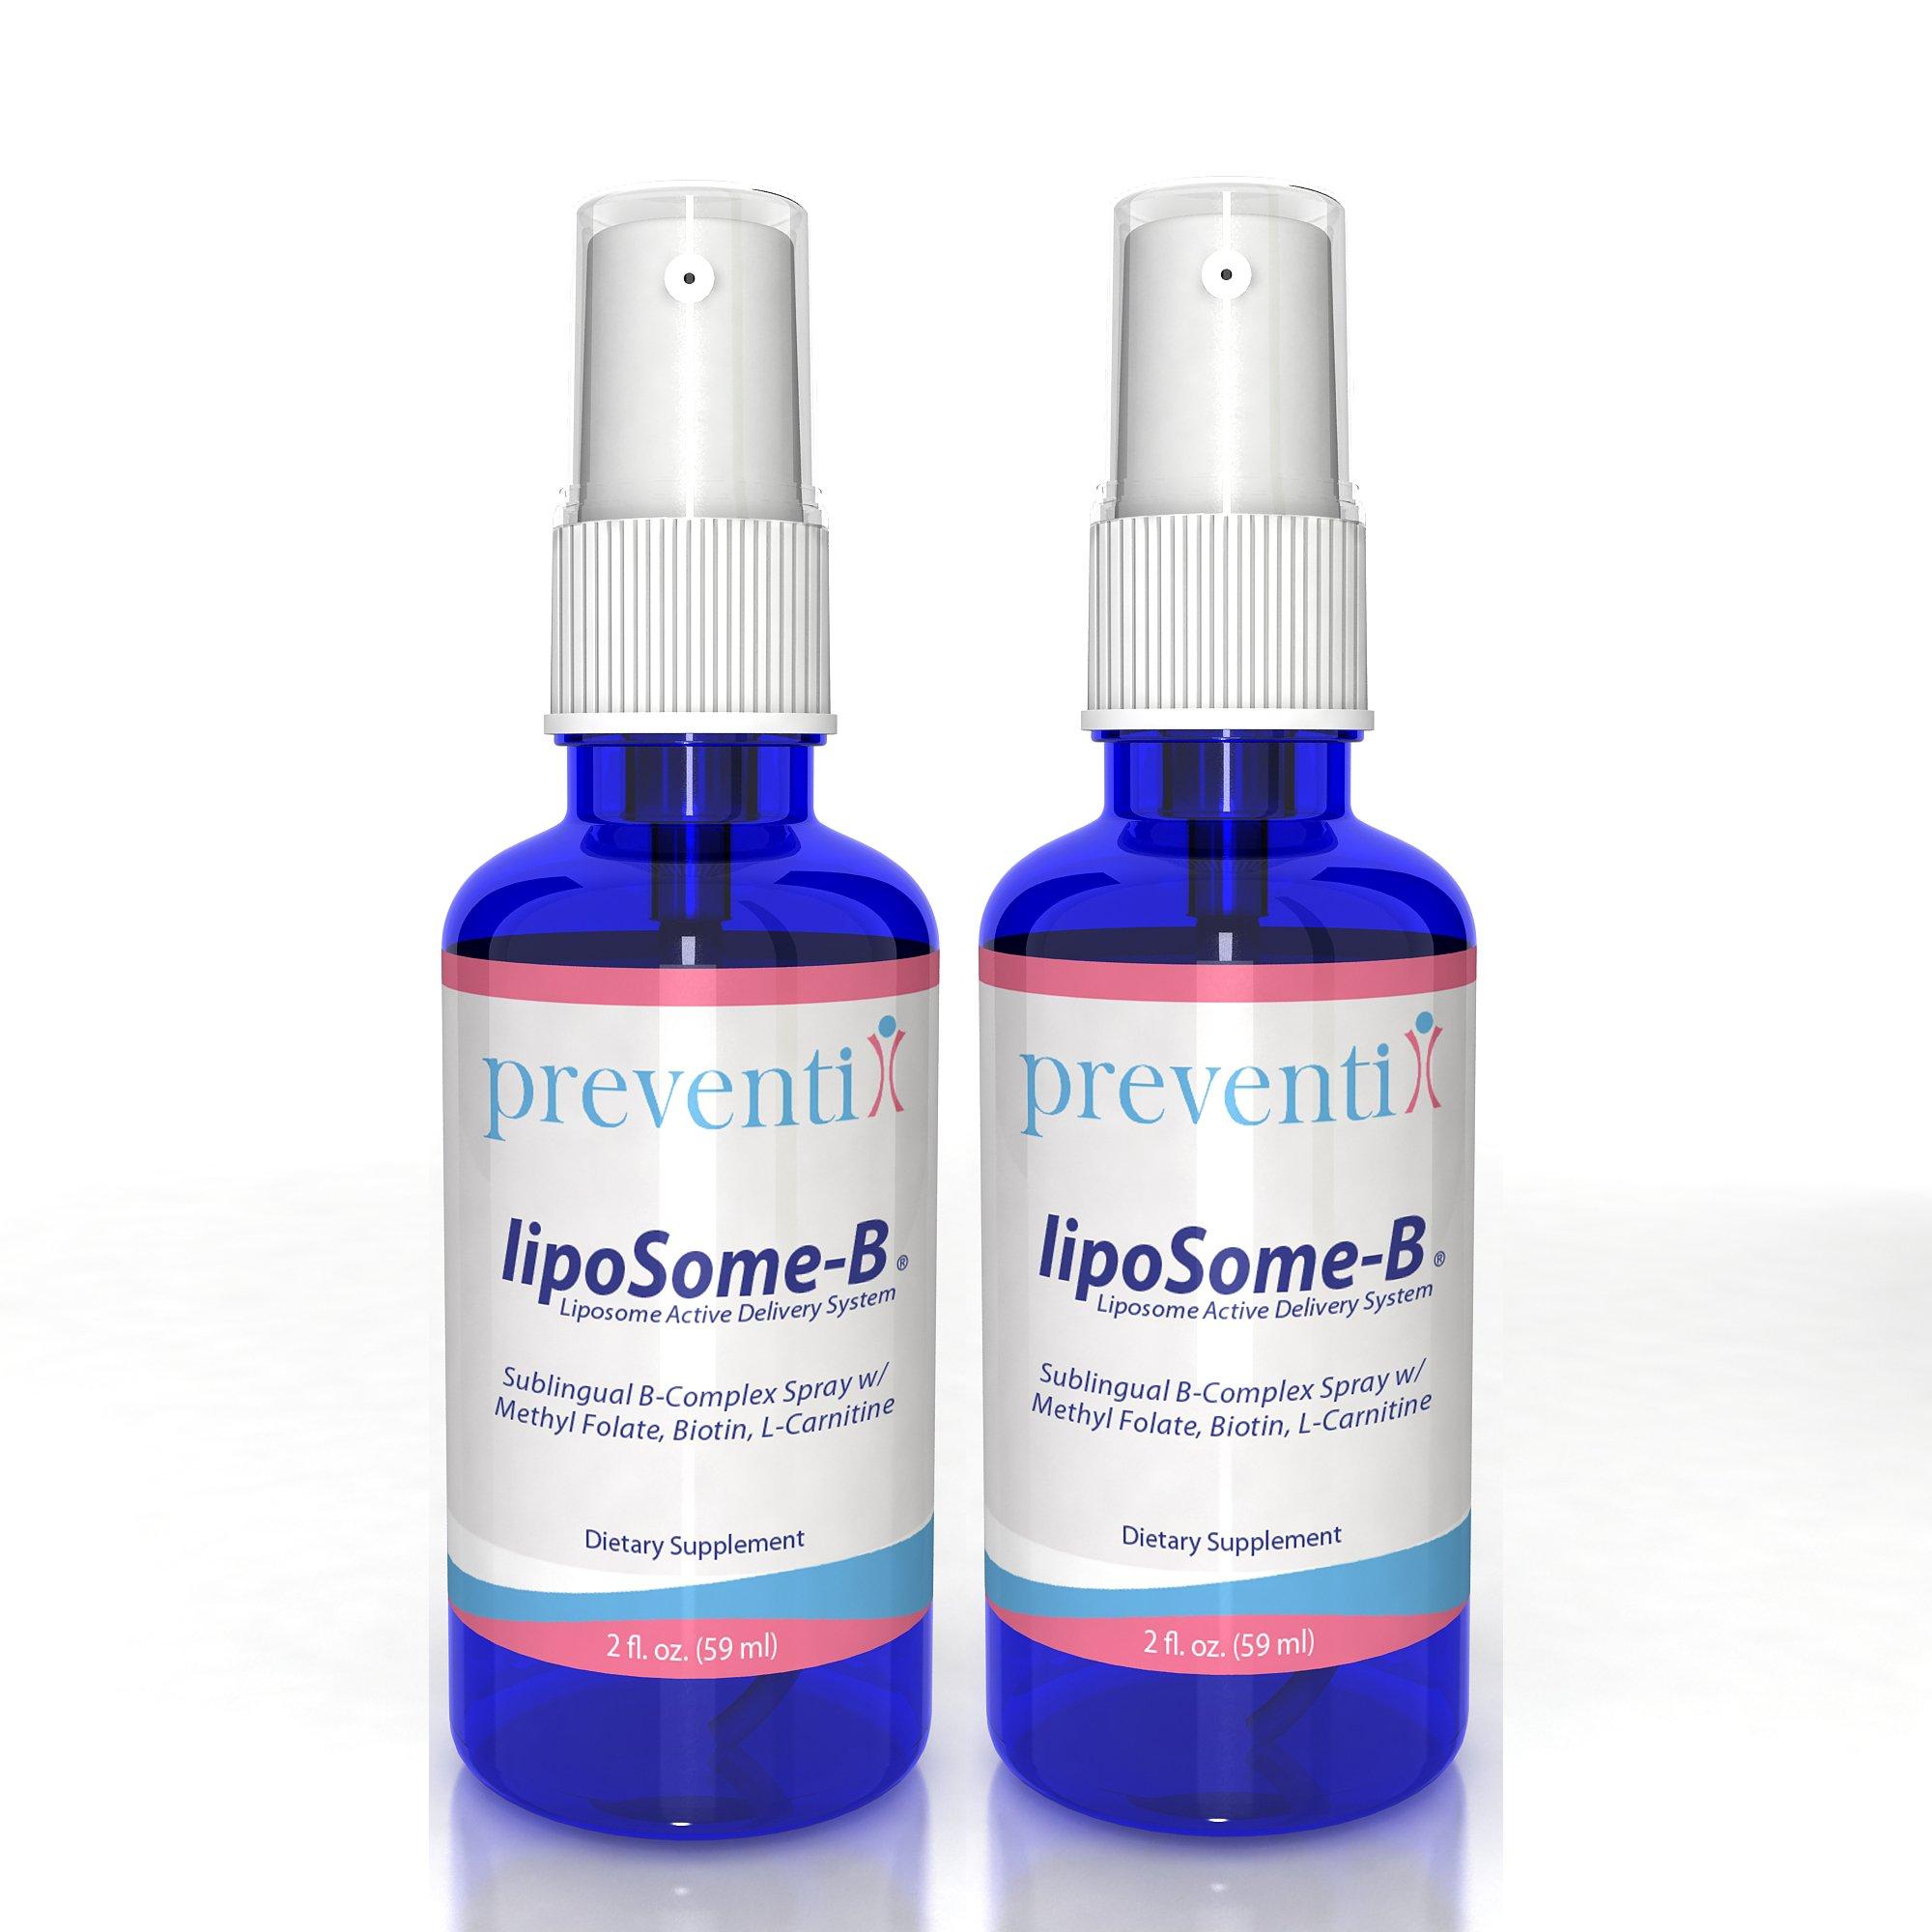 LipoSome B12 Complex Spray_2 Pack Bundle: A Superior Liposomal B12 Complex Spray w/Methyl Folate, Biotin, L-Carnitine. Advanced liposome formulation significantly increases absorption/bioavailability